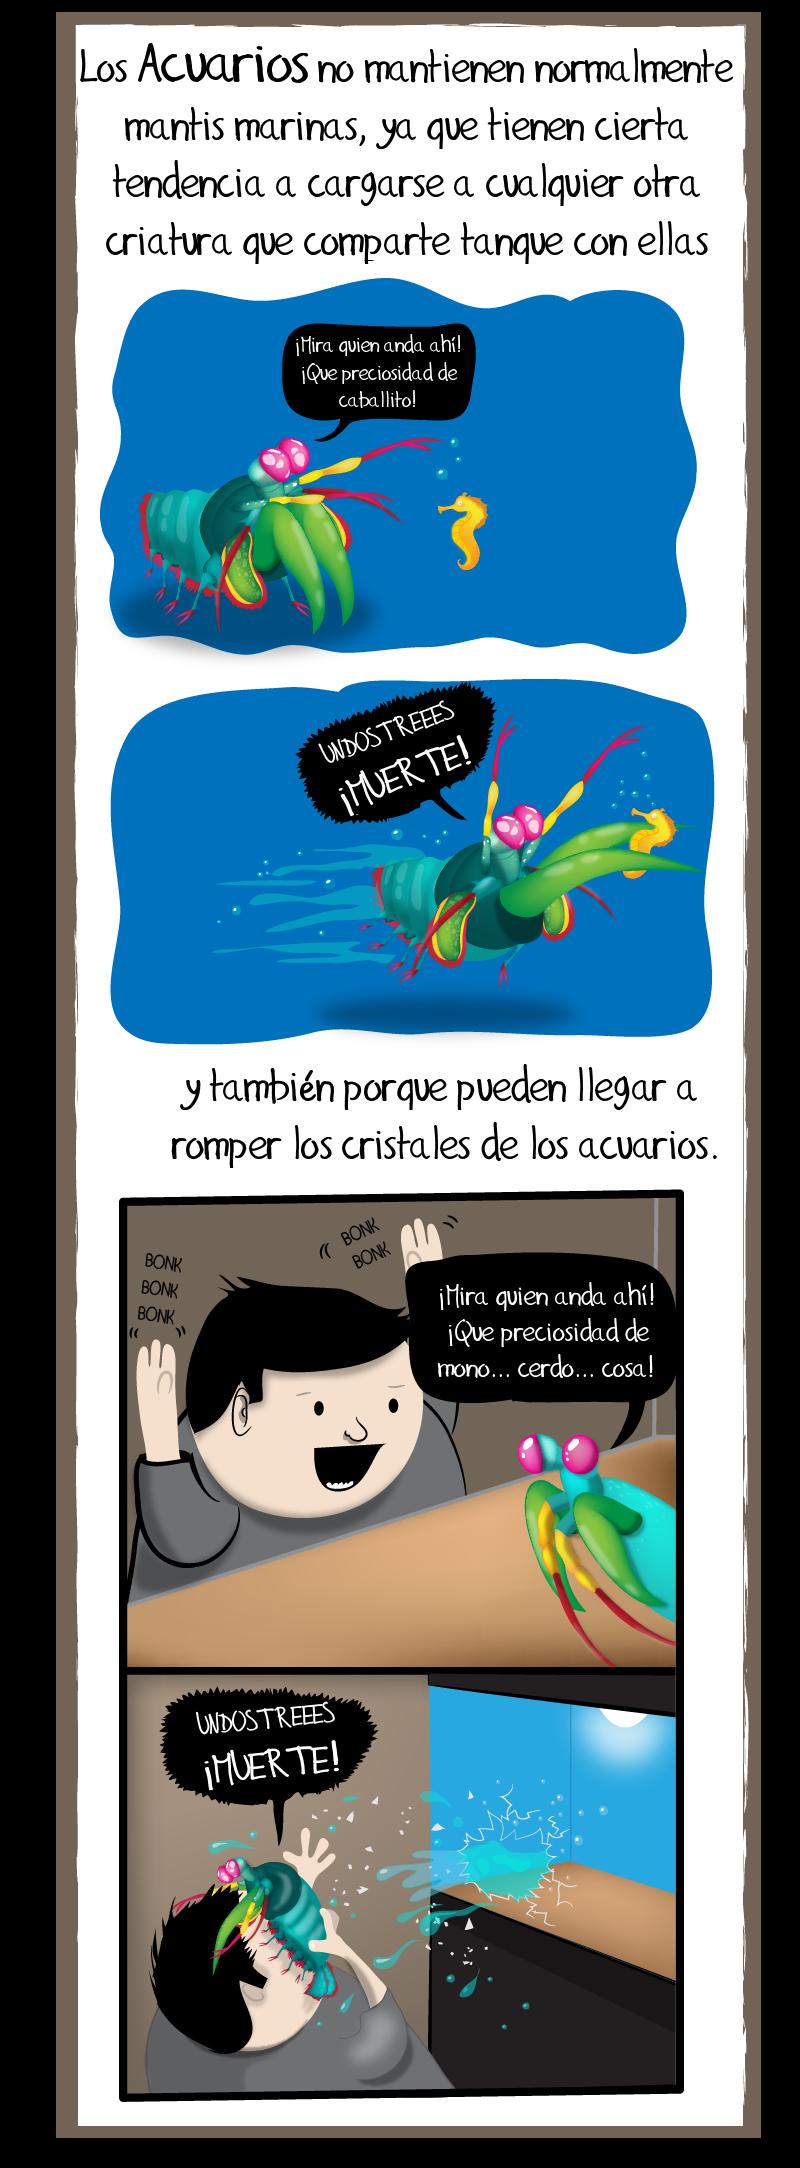 mantis-marina-6